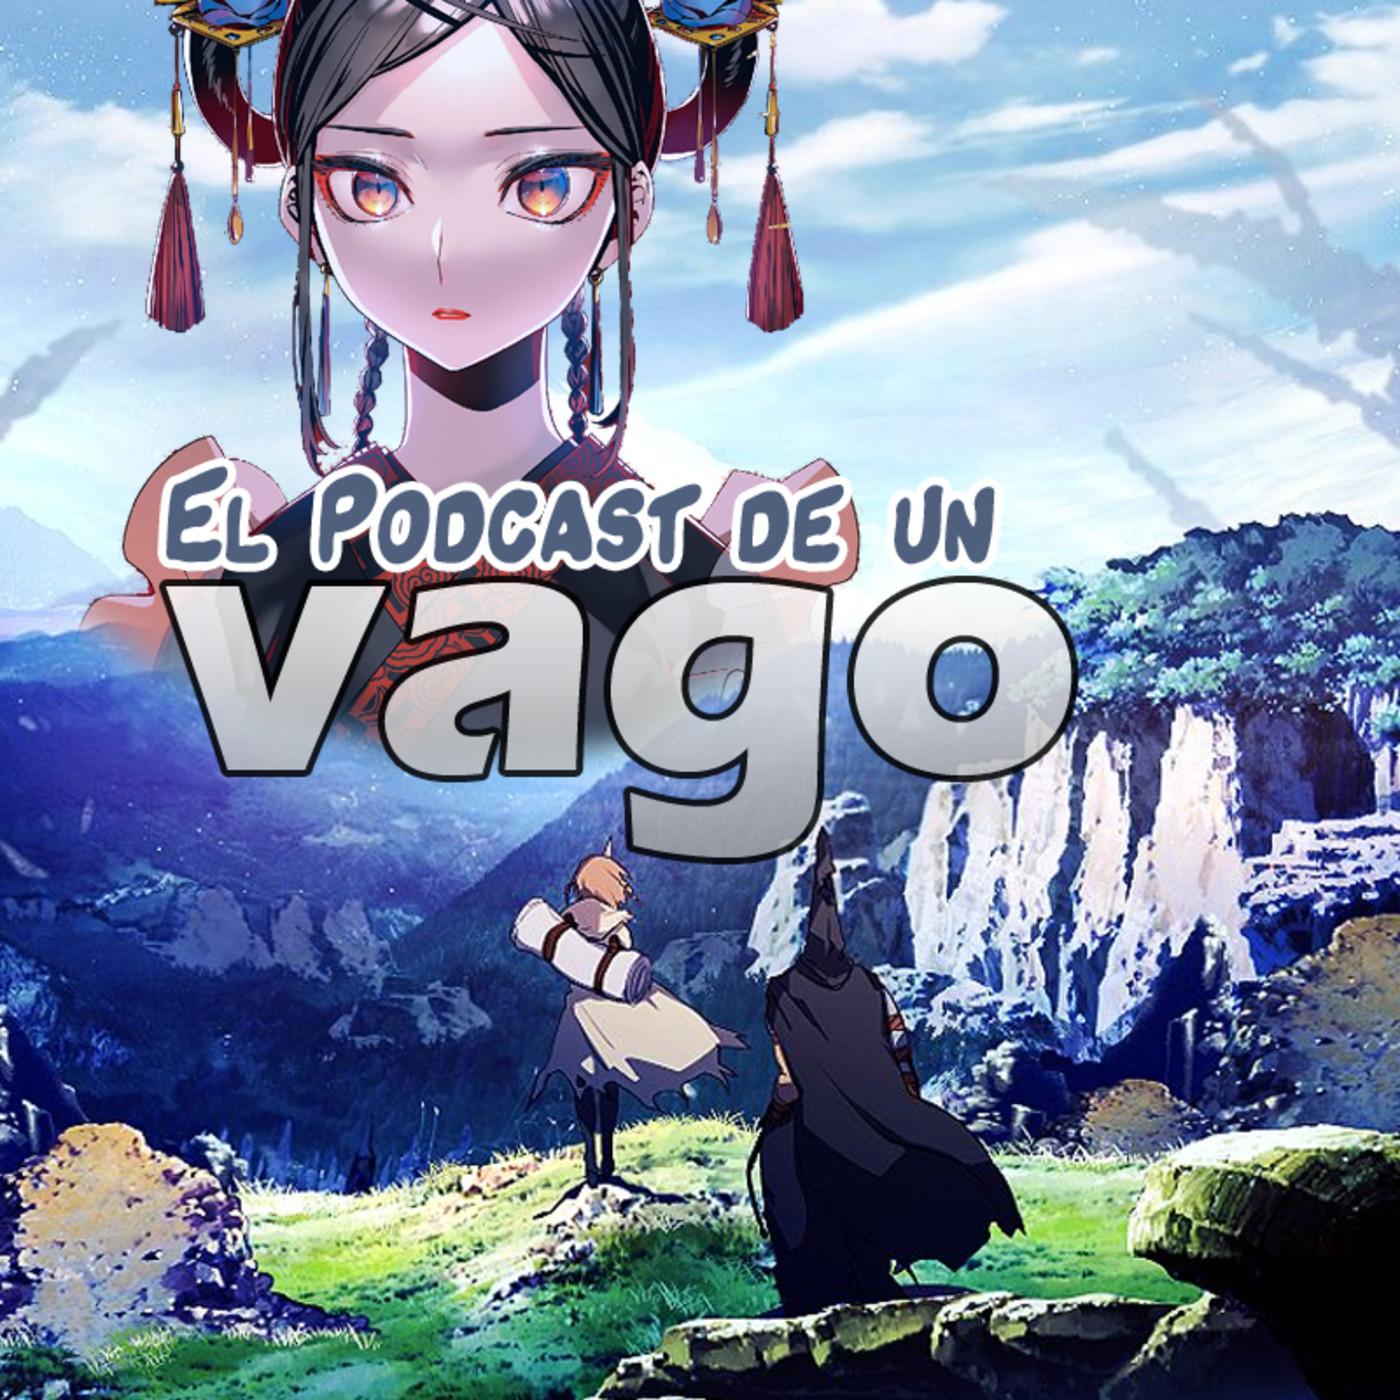 VagoPodcast #79: Killing Me/ Killing You... Act-Age